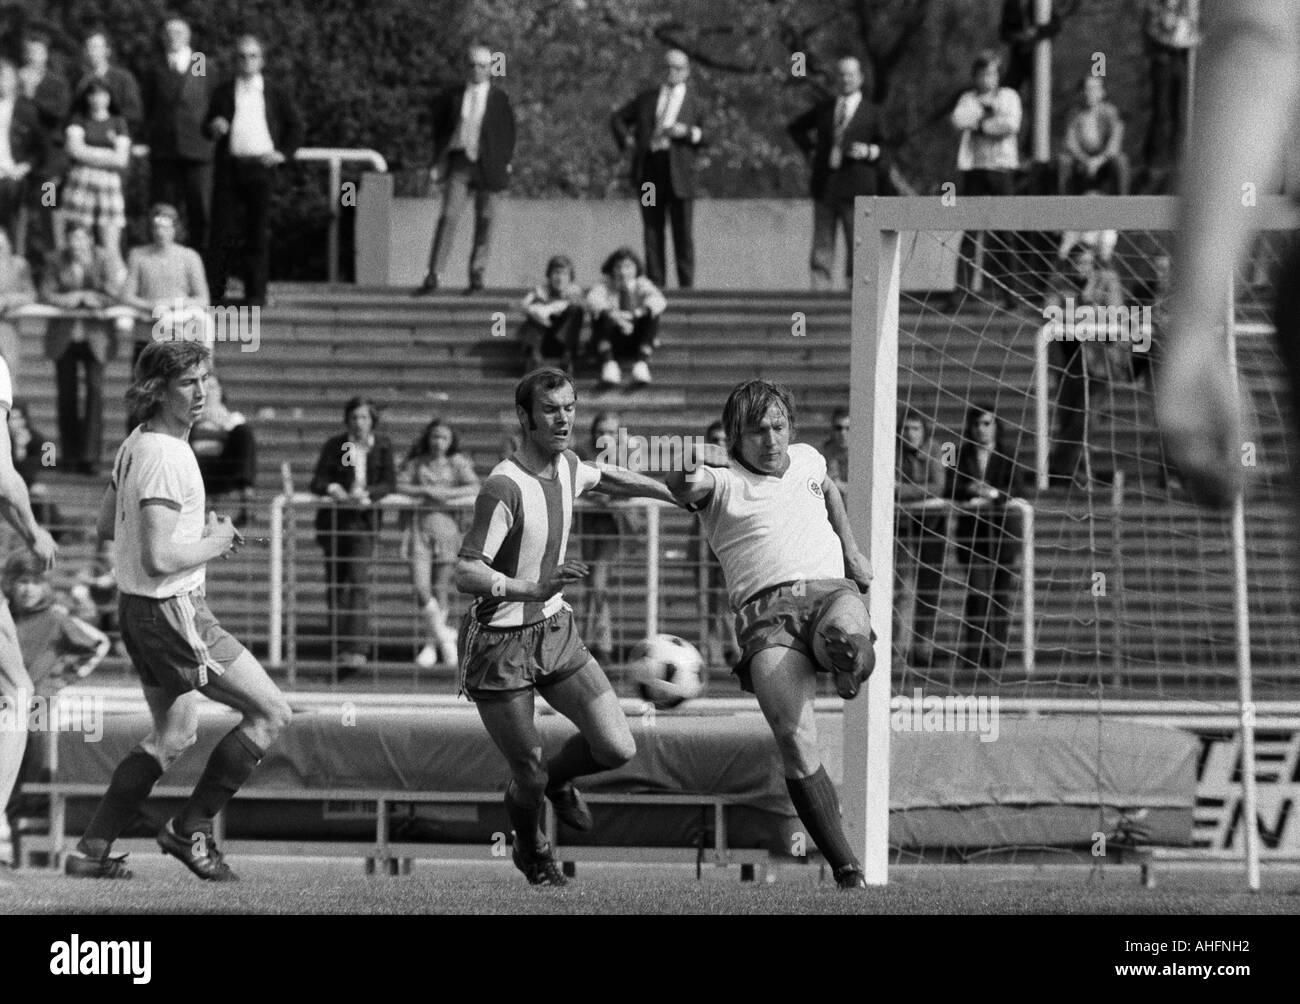 football, Bundesliga, 1971/1972, Rot-Weiss Oberhausen versus Hertha BSC Berlin 5:2, Niederrhein Stadium in Oberhausen, scene of the match, f.l.t.r. Ditmar Jakobs (RWO), Erwin Hermandung (Berlin), Lothar Kobluhn (RWO) - Stock Image